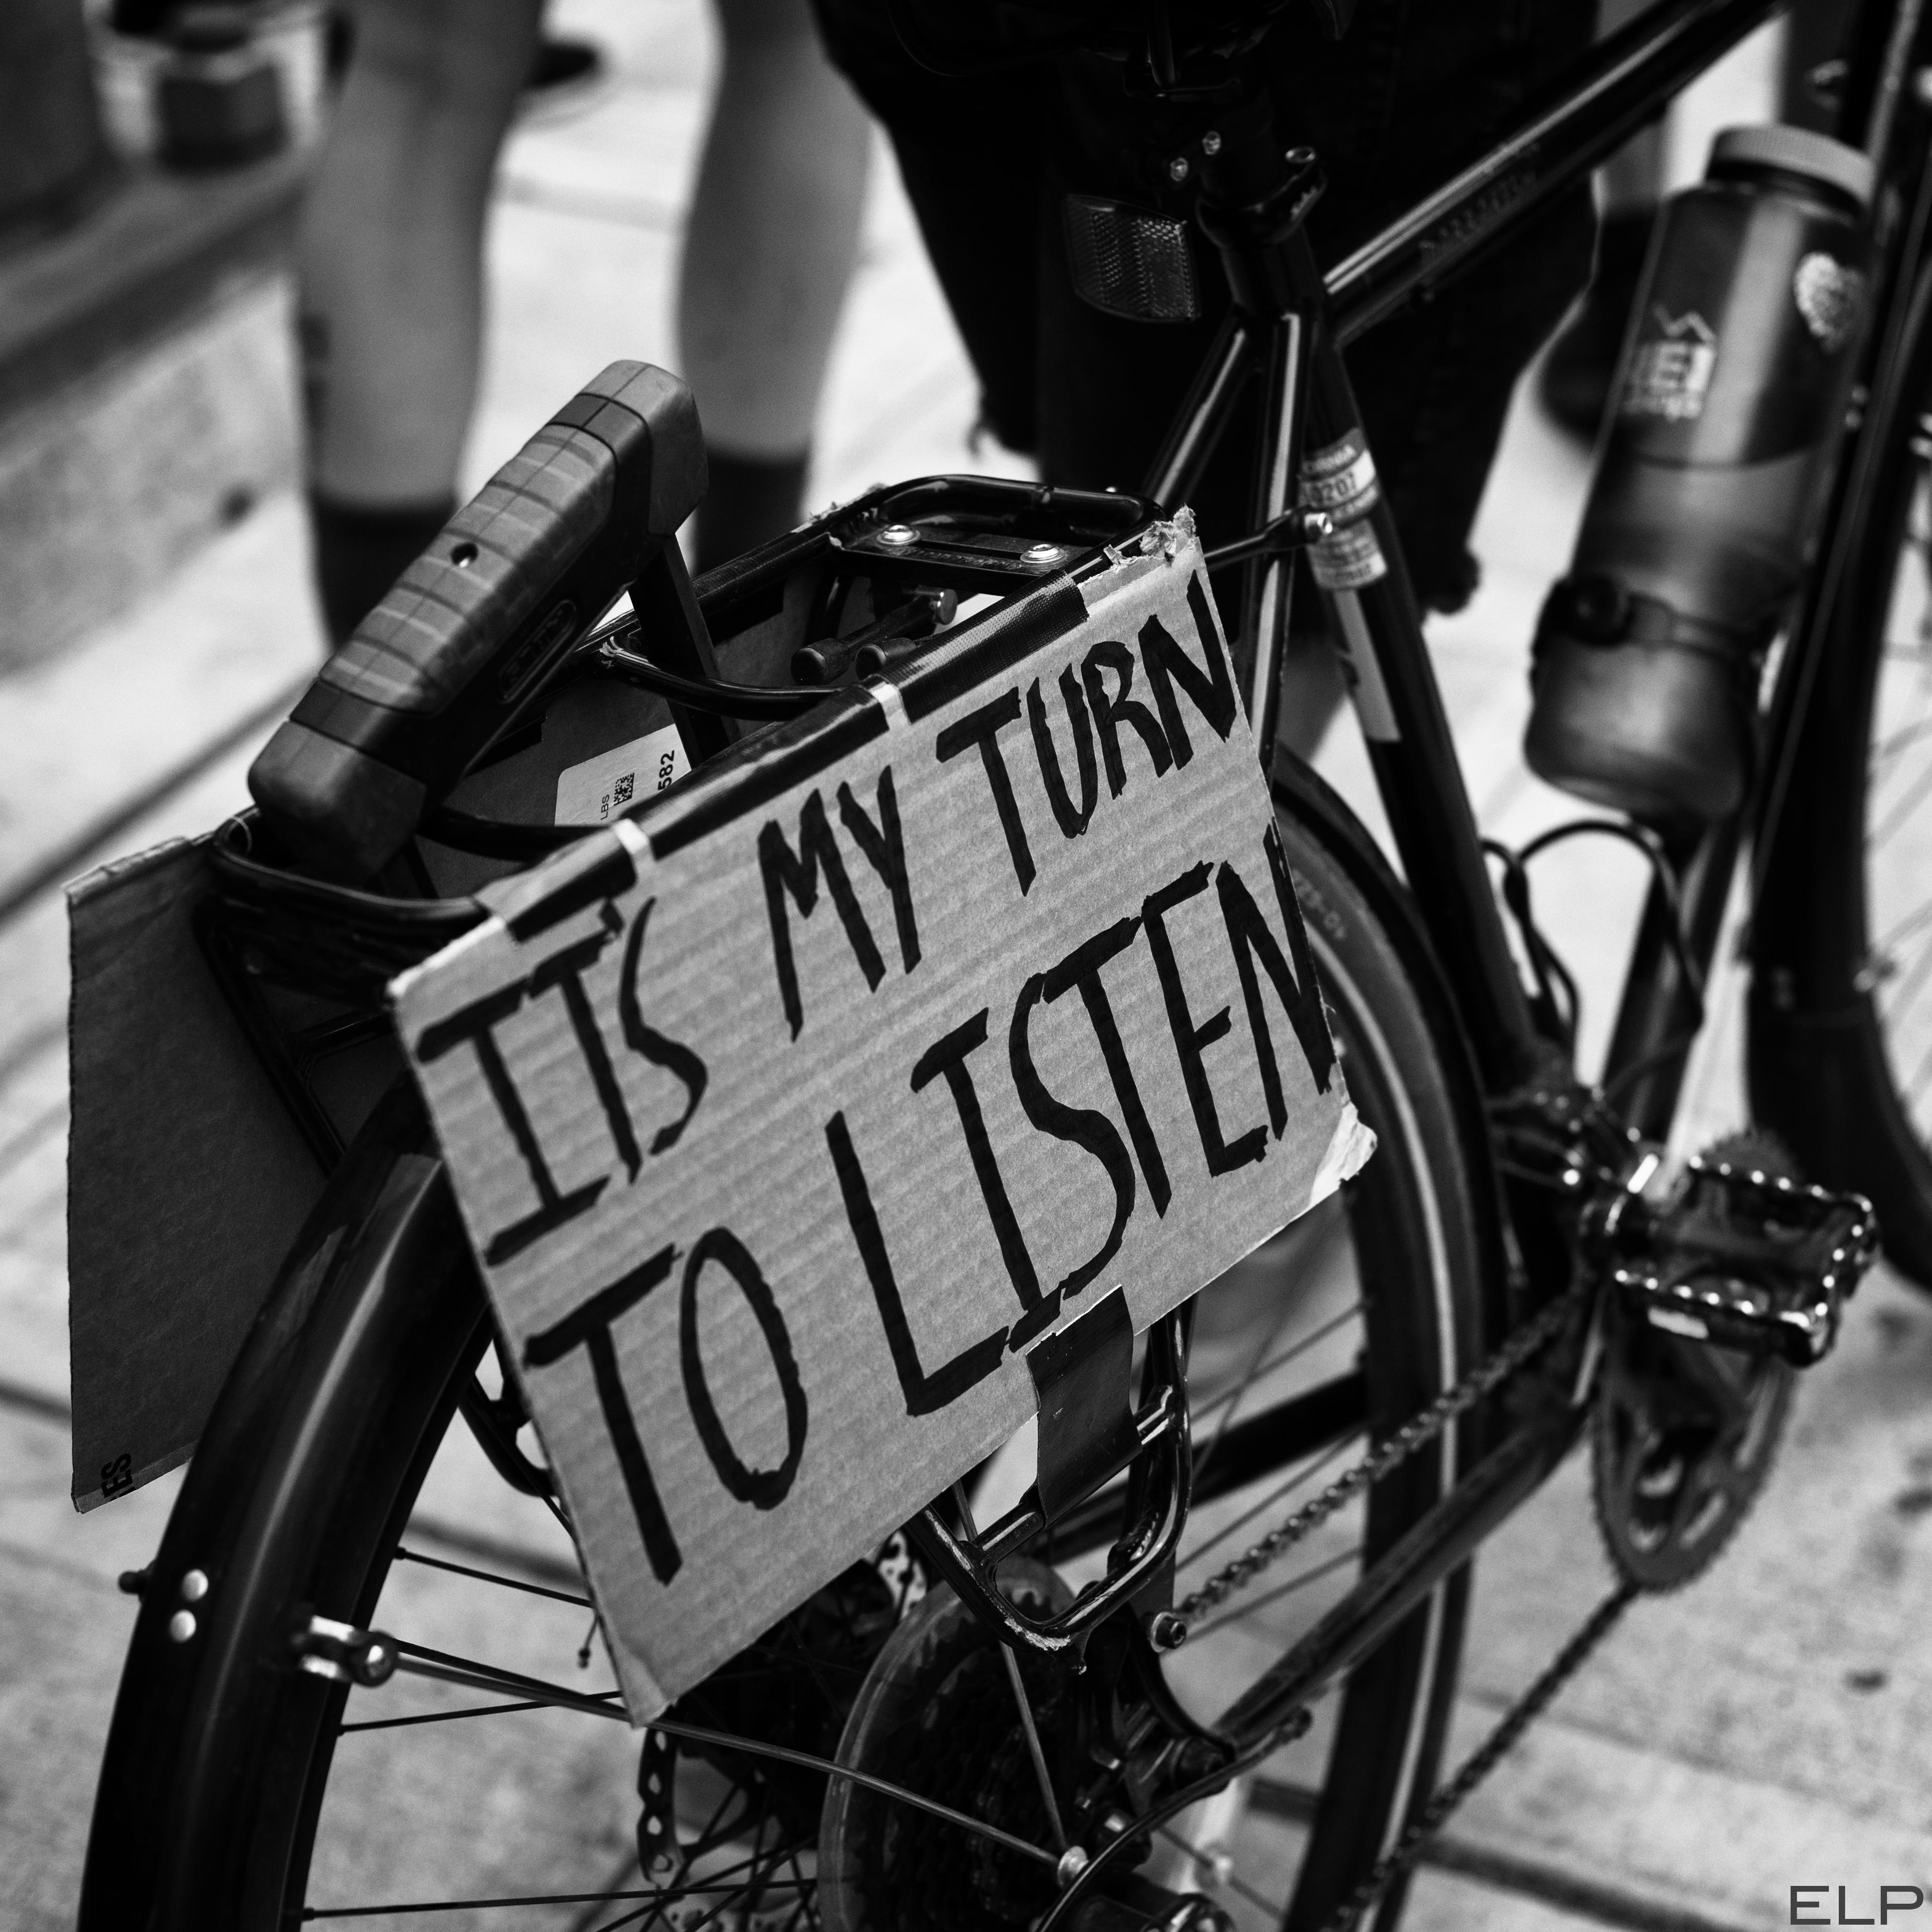 It's My Turn To Listen